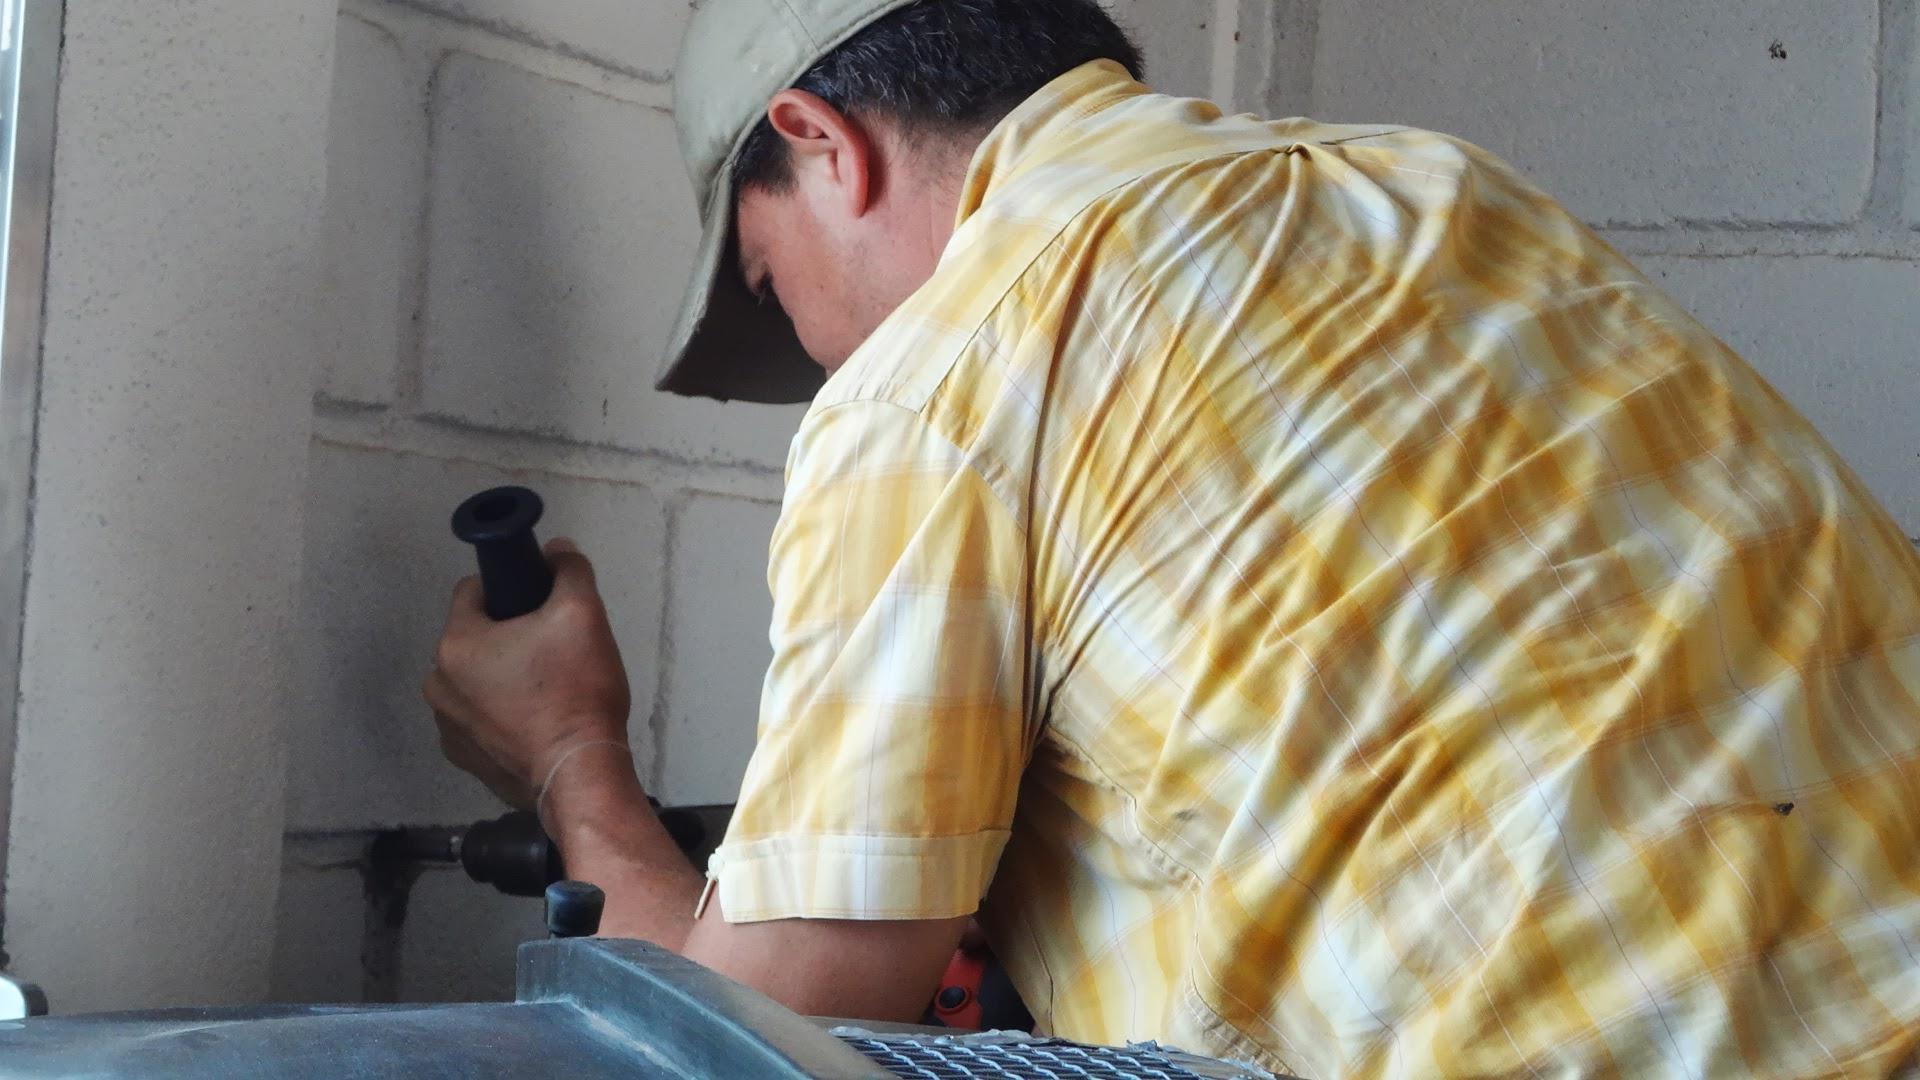 Raph drills into school wall